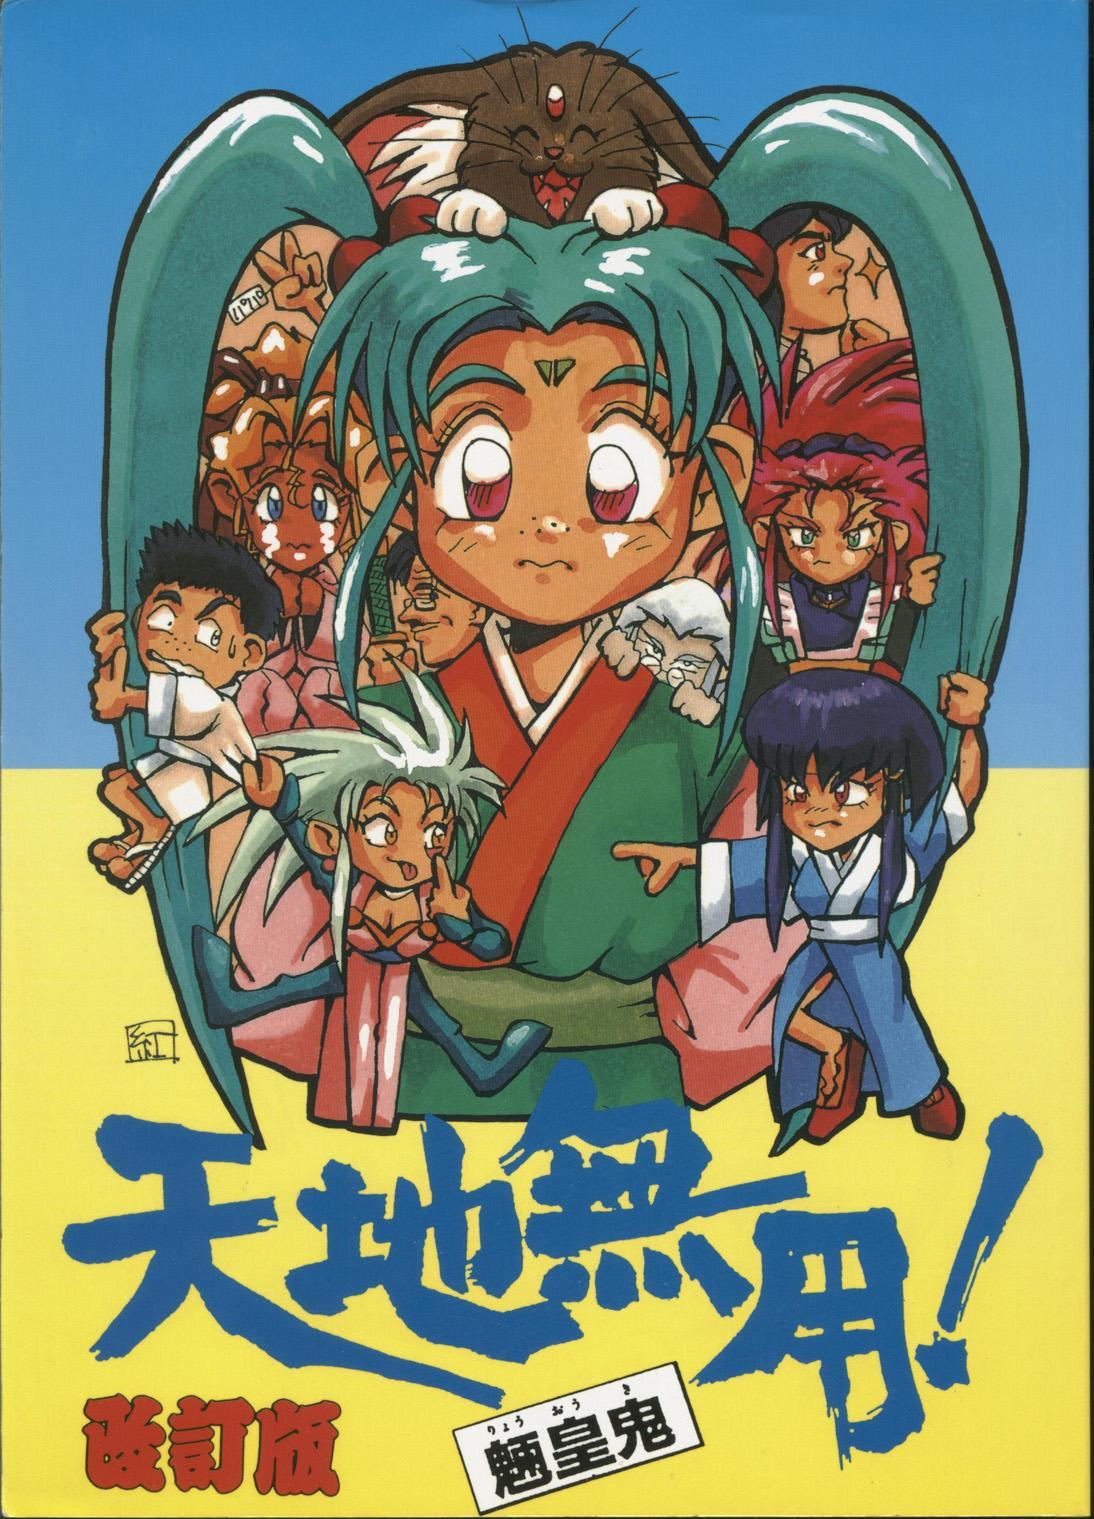 [B.B.C] Tenchi Muyou! Ryou-ou-ki Kaiteiben (Tenchi Muyou!) 0